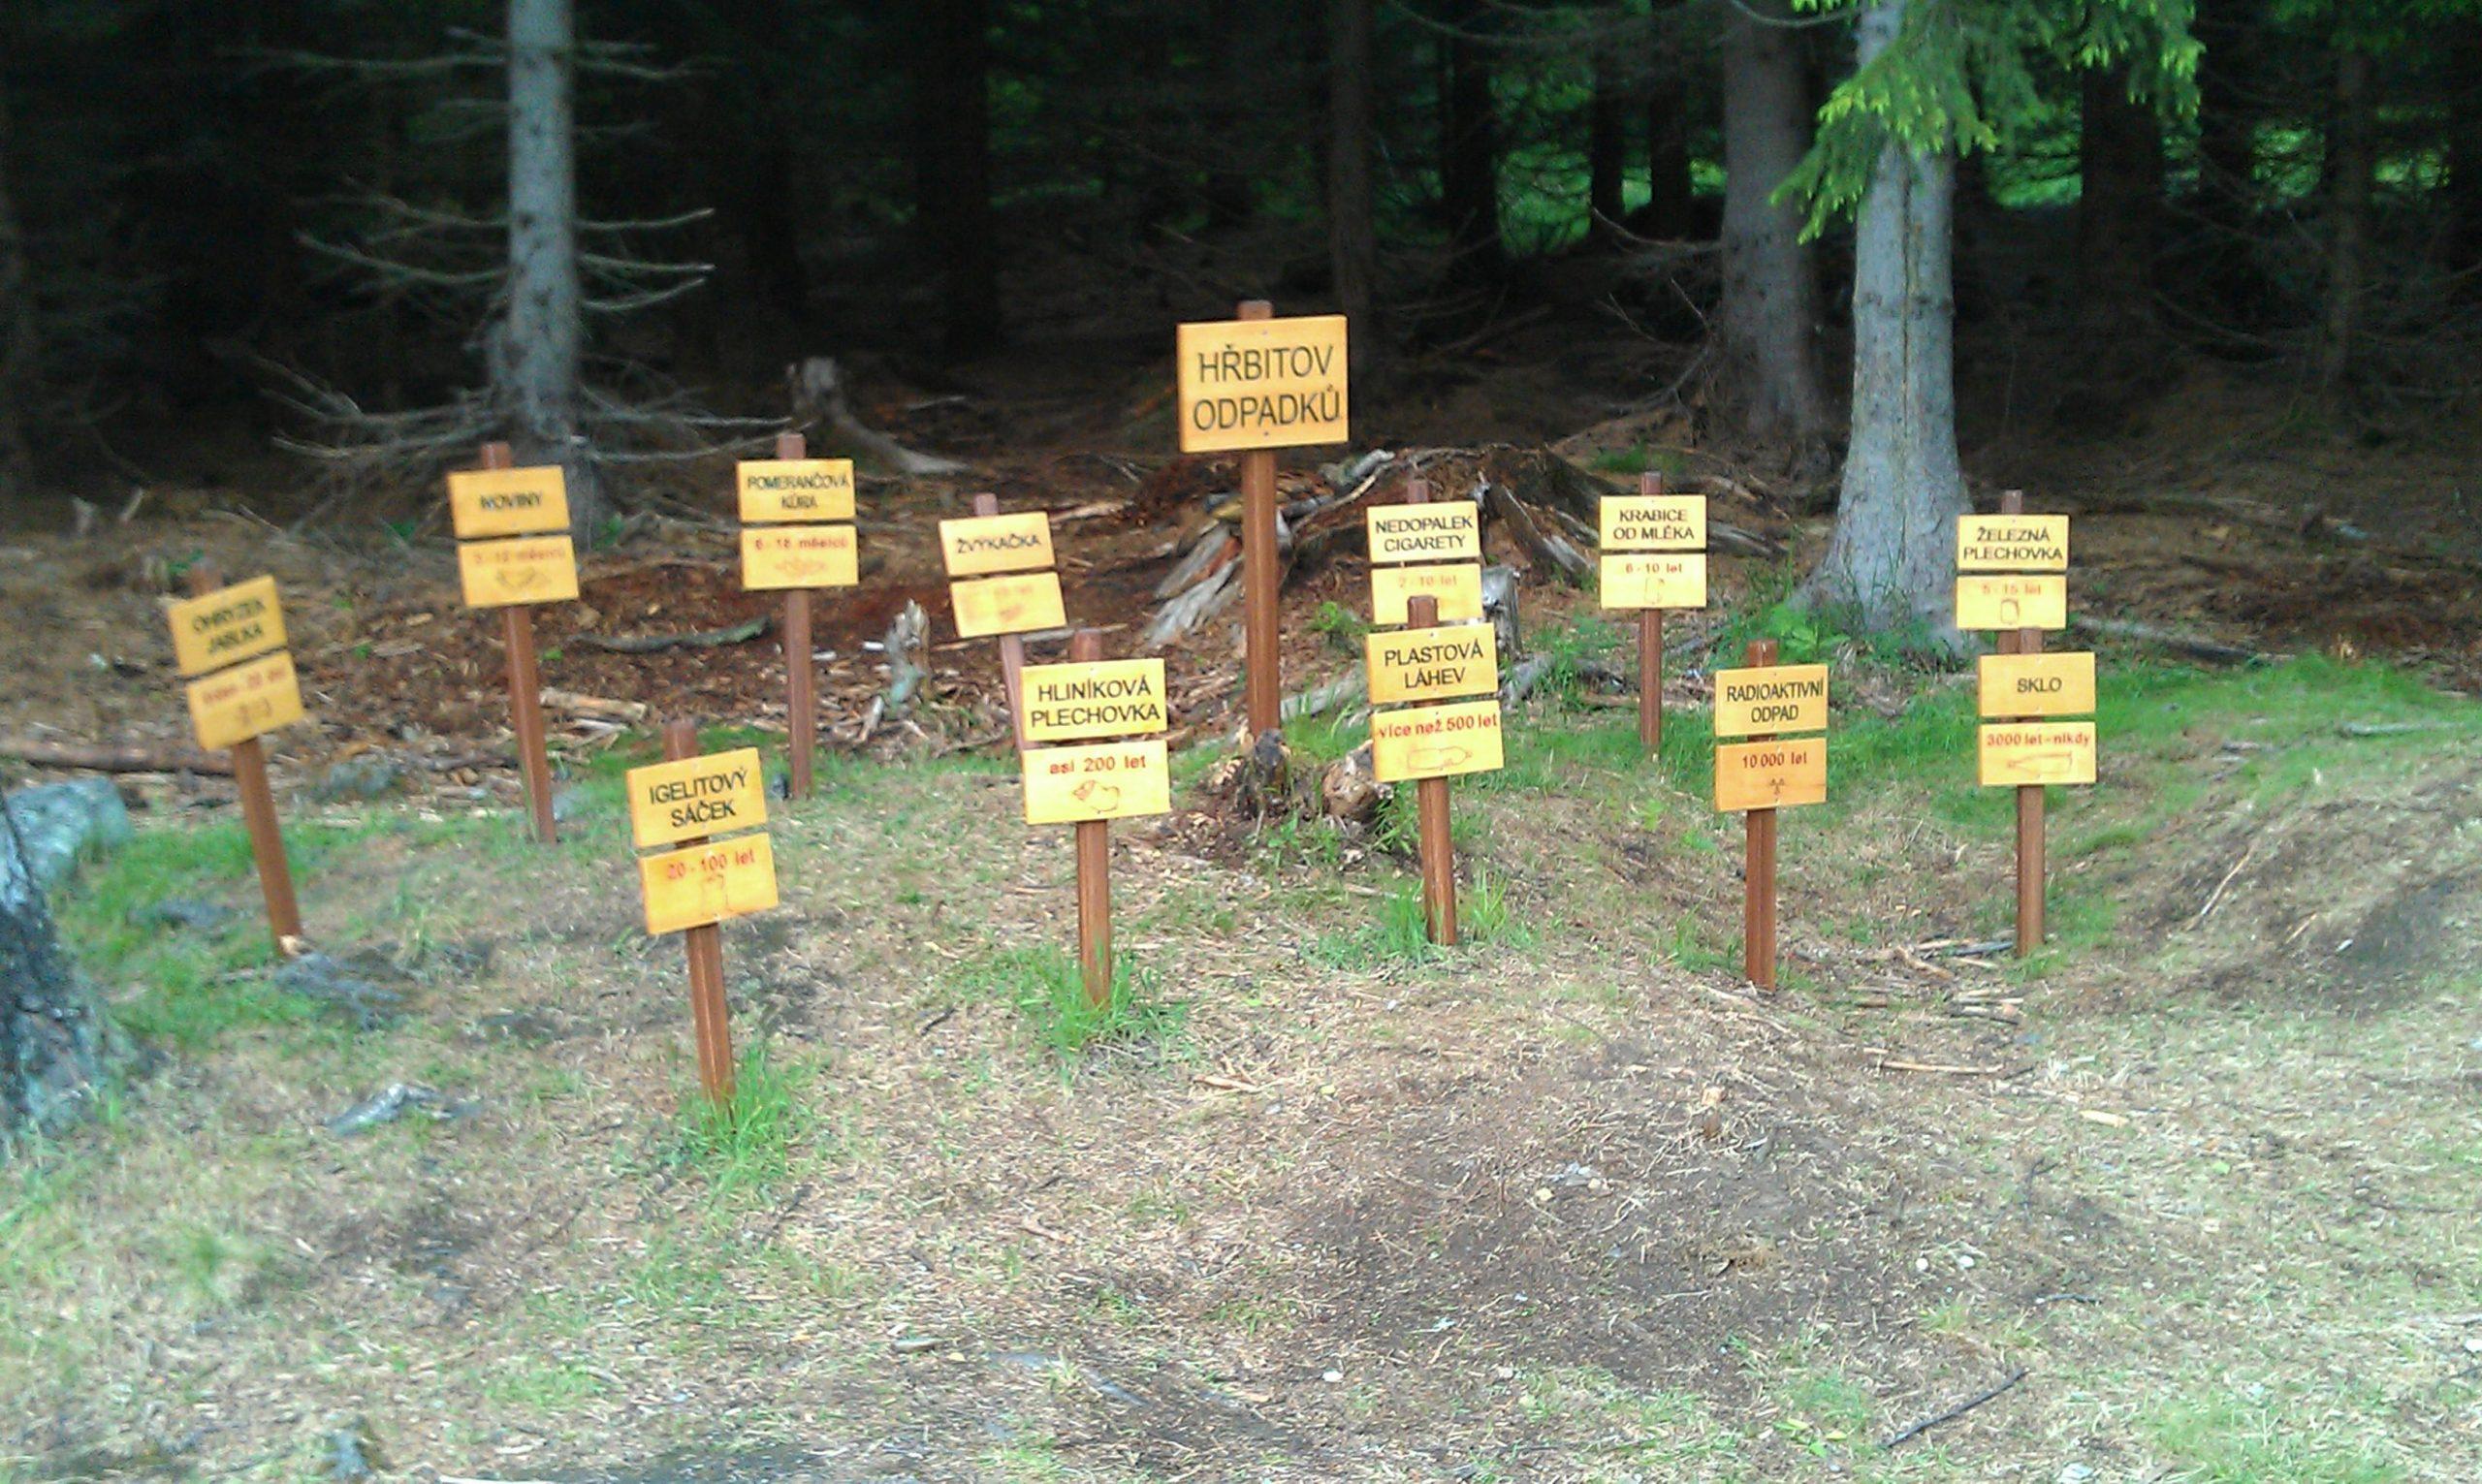 hrbitov odpadku